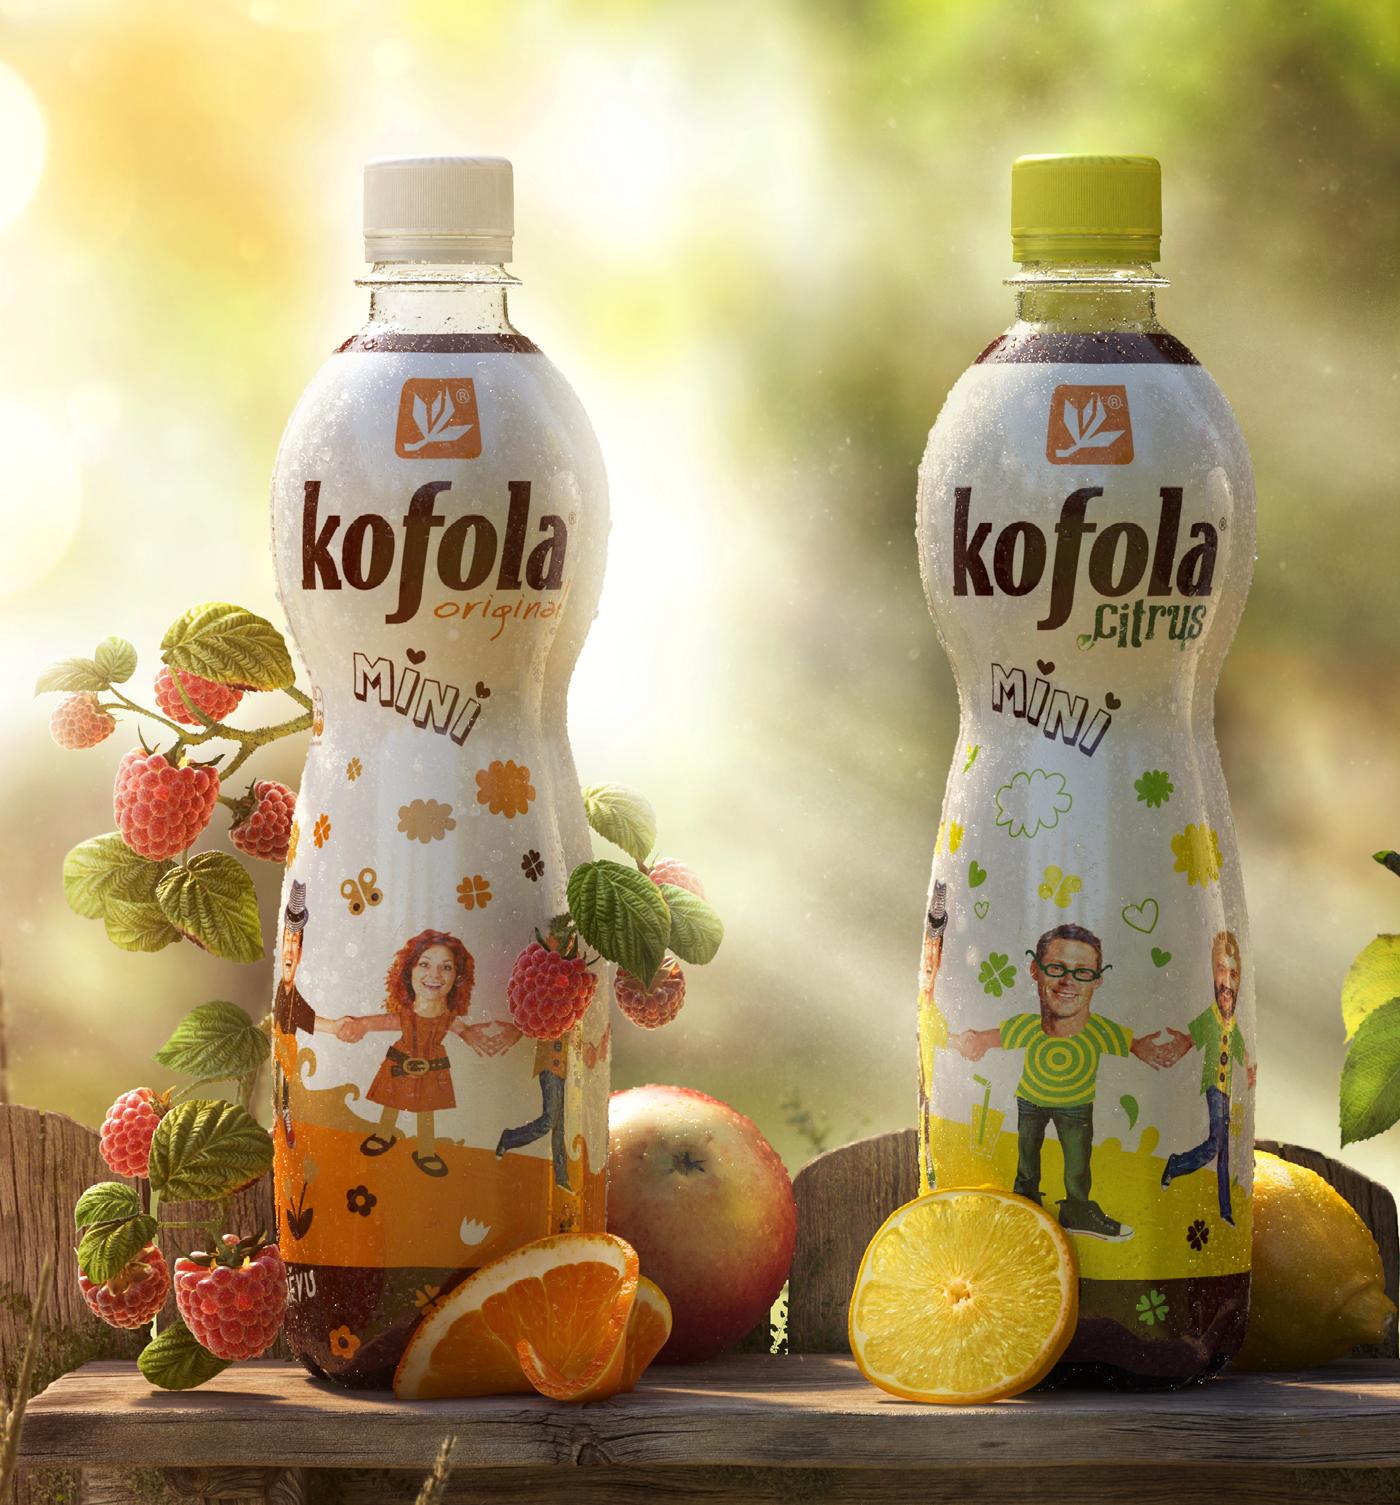 Kofola soft drinks